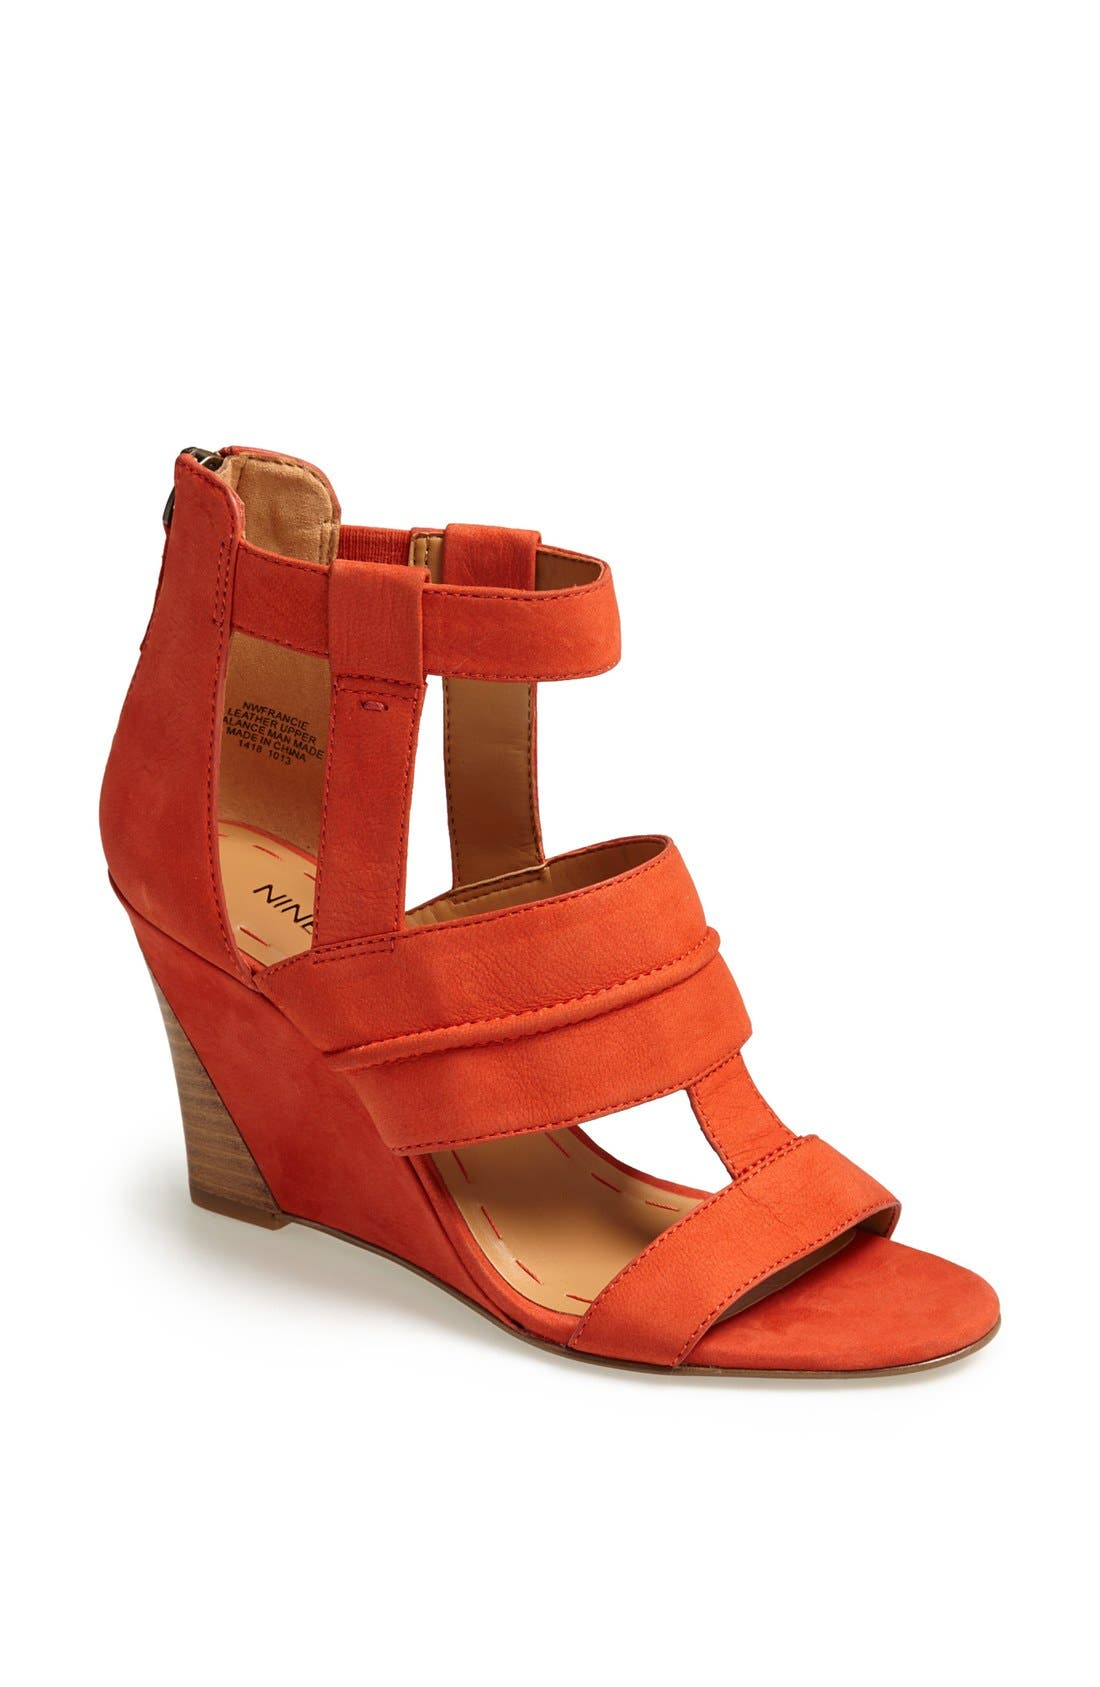 Main Image - Nine West 'Francie' Leather Sandal